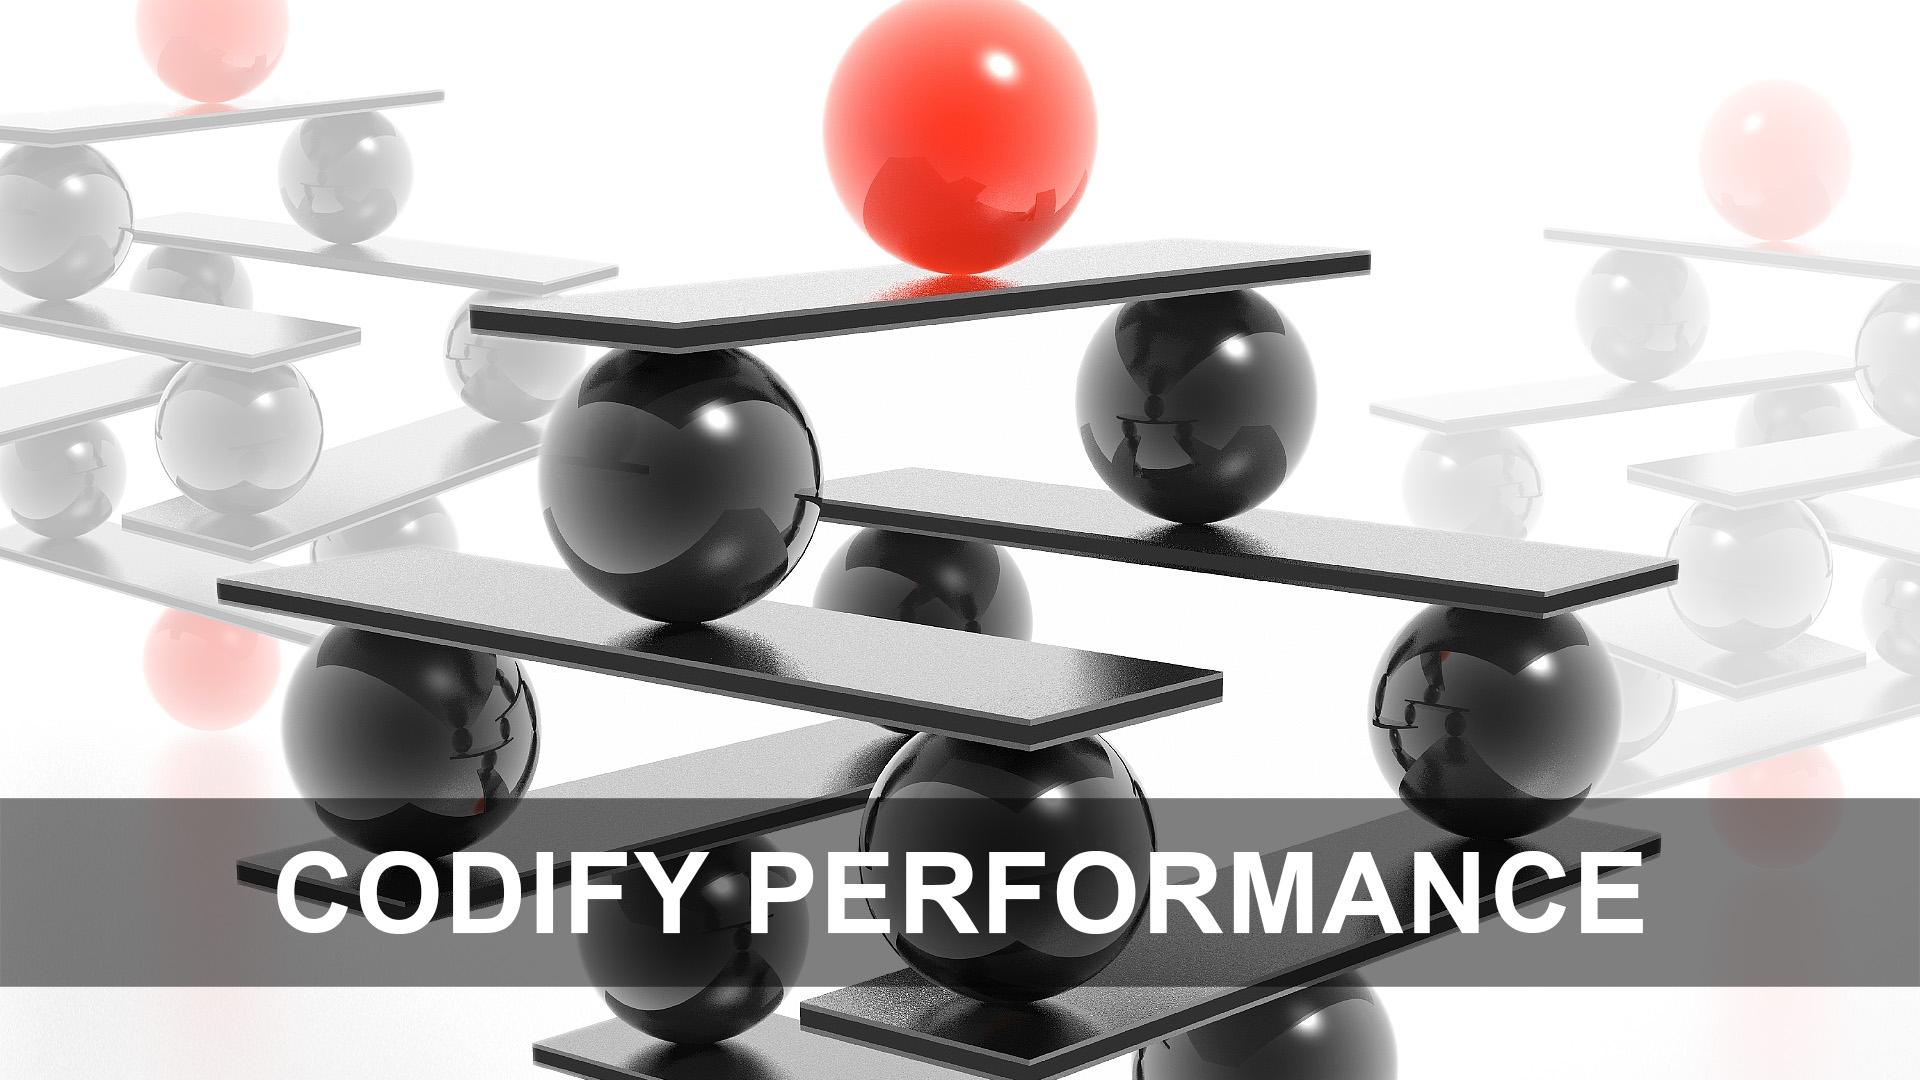 Codify Performance - KAM.jpg